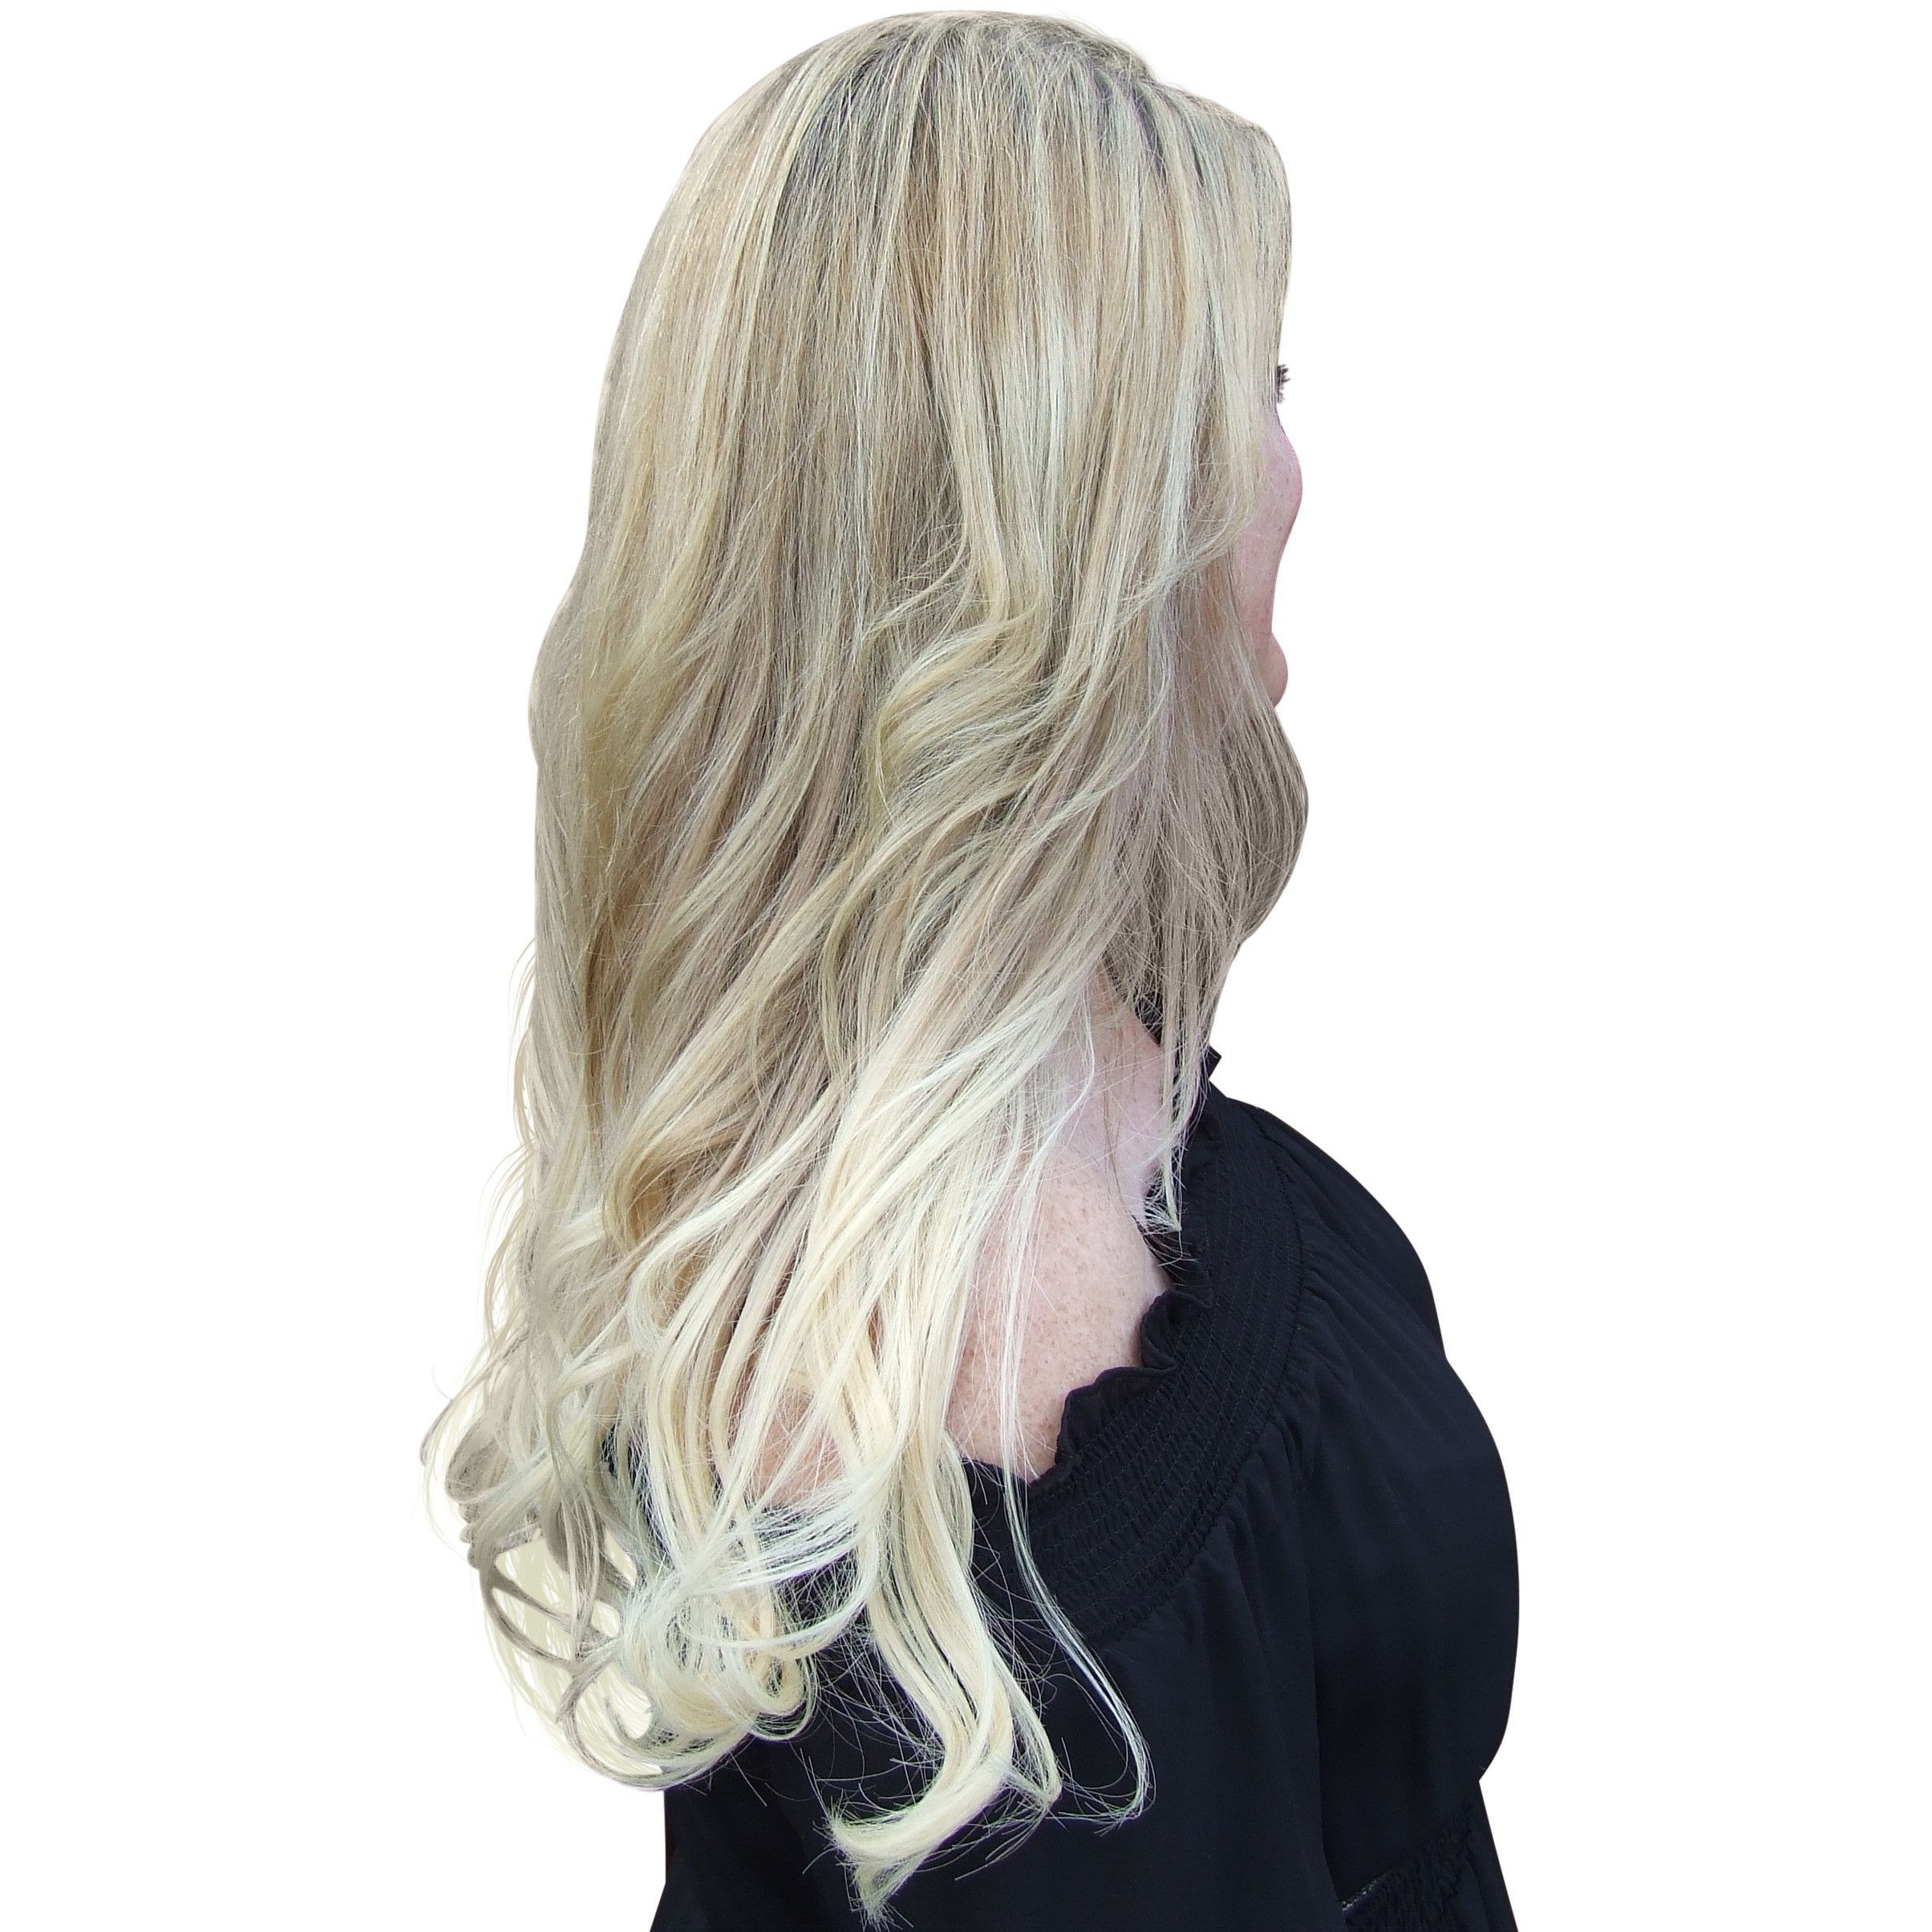 Just Highlights Super Blonde California Girls' Hair